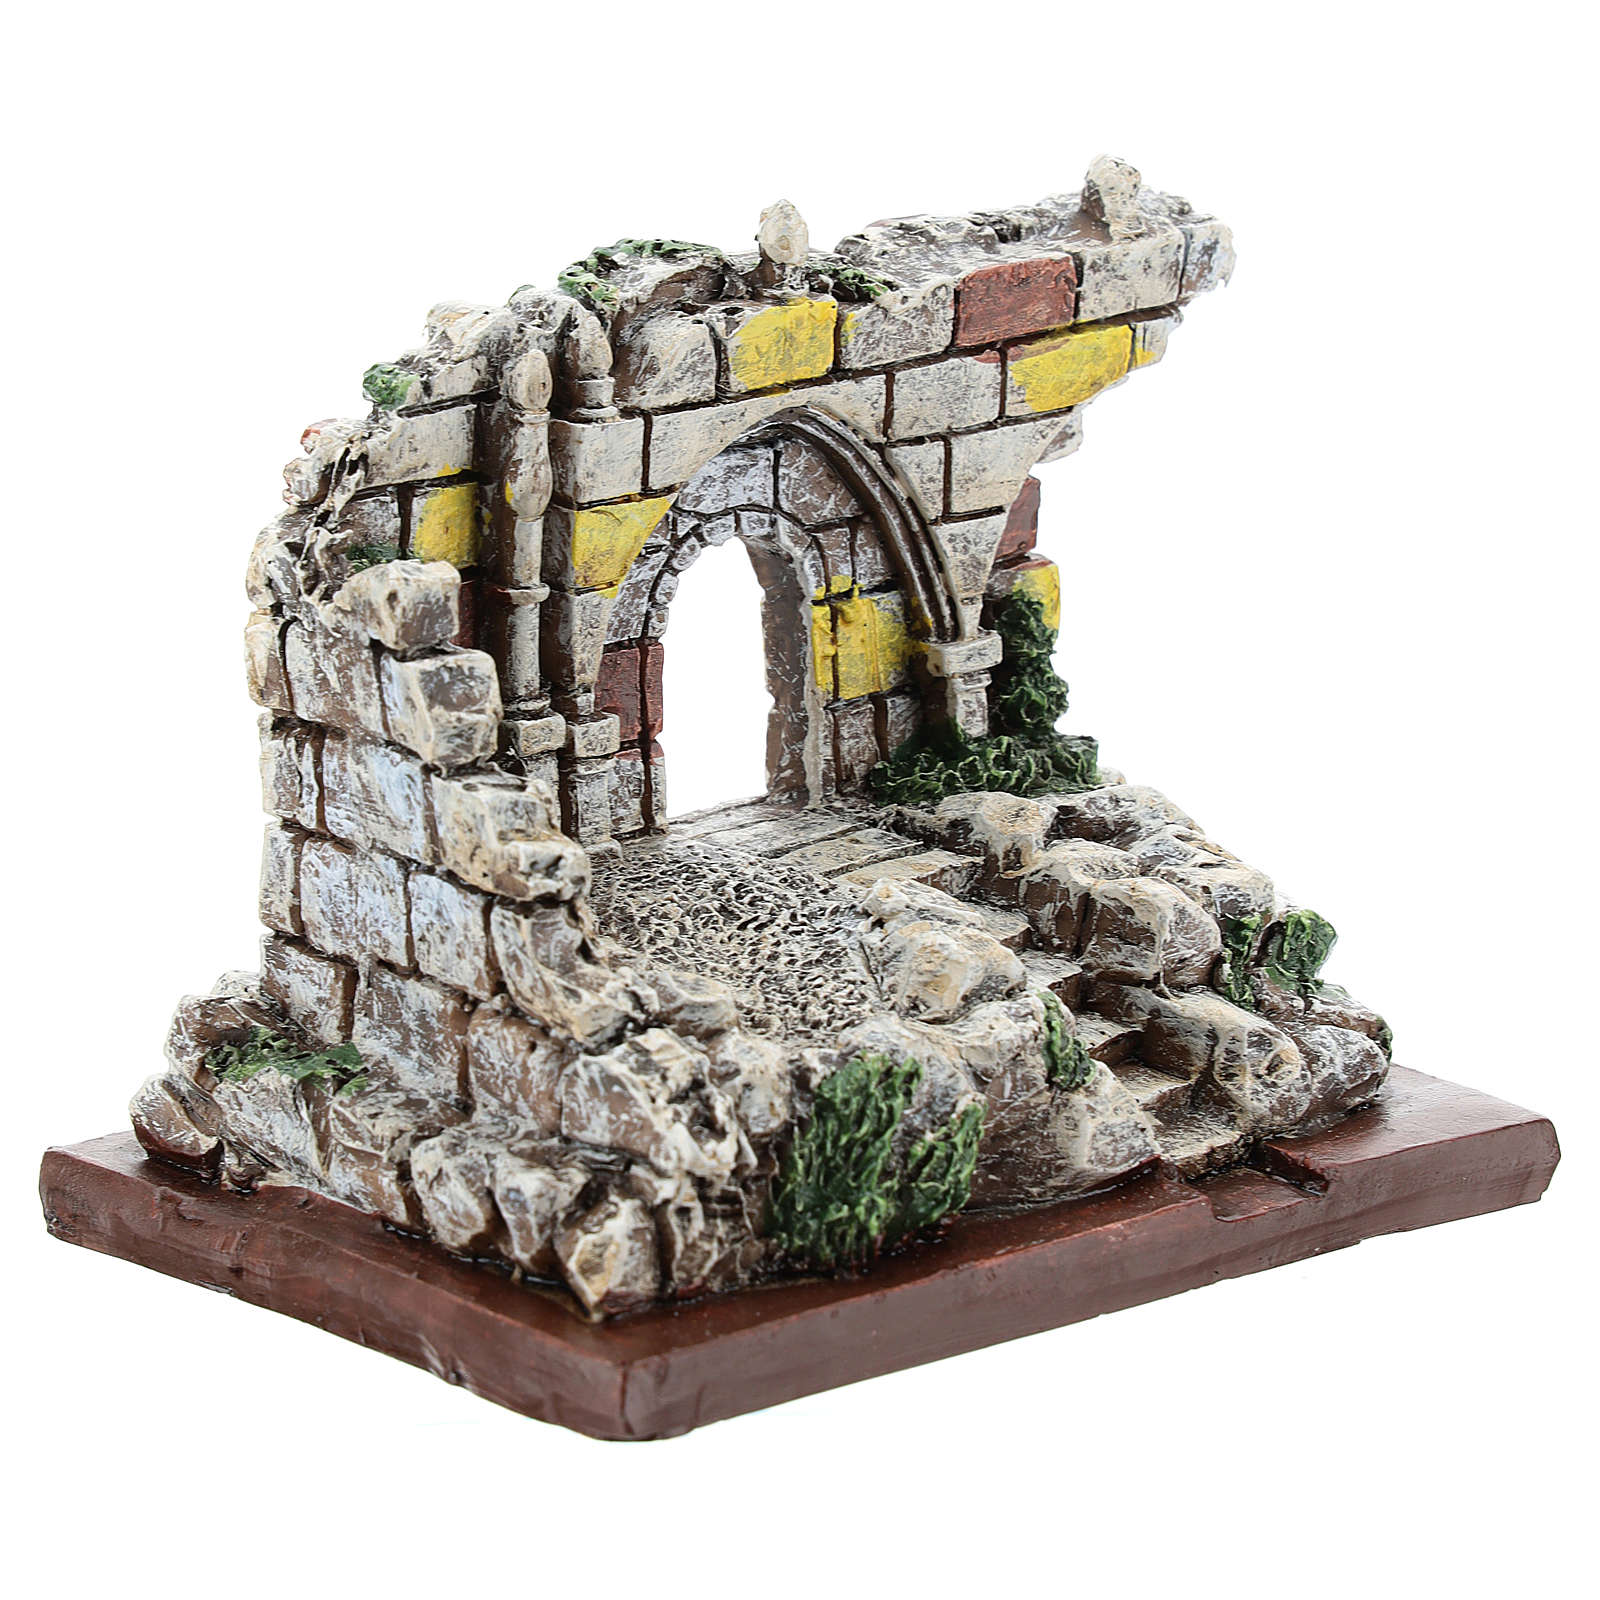 Nativity scene setting, archway ruins Moranduzzo in resin for 4-6 cm statues 4